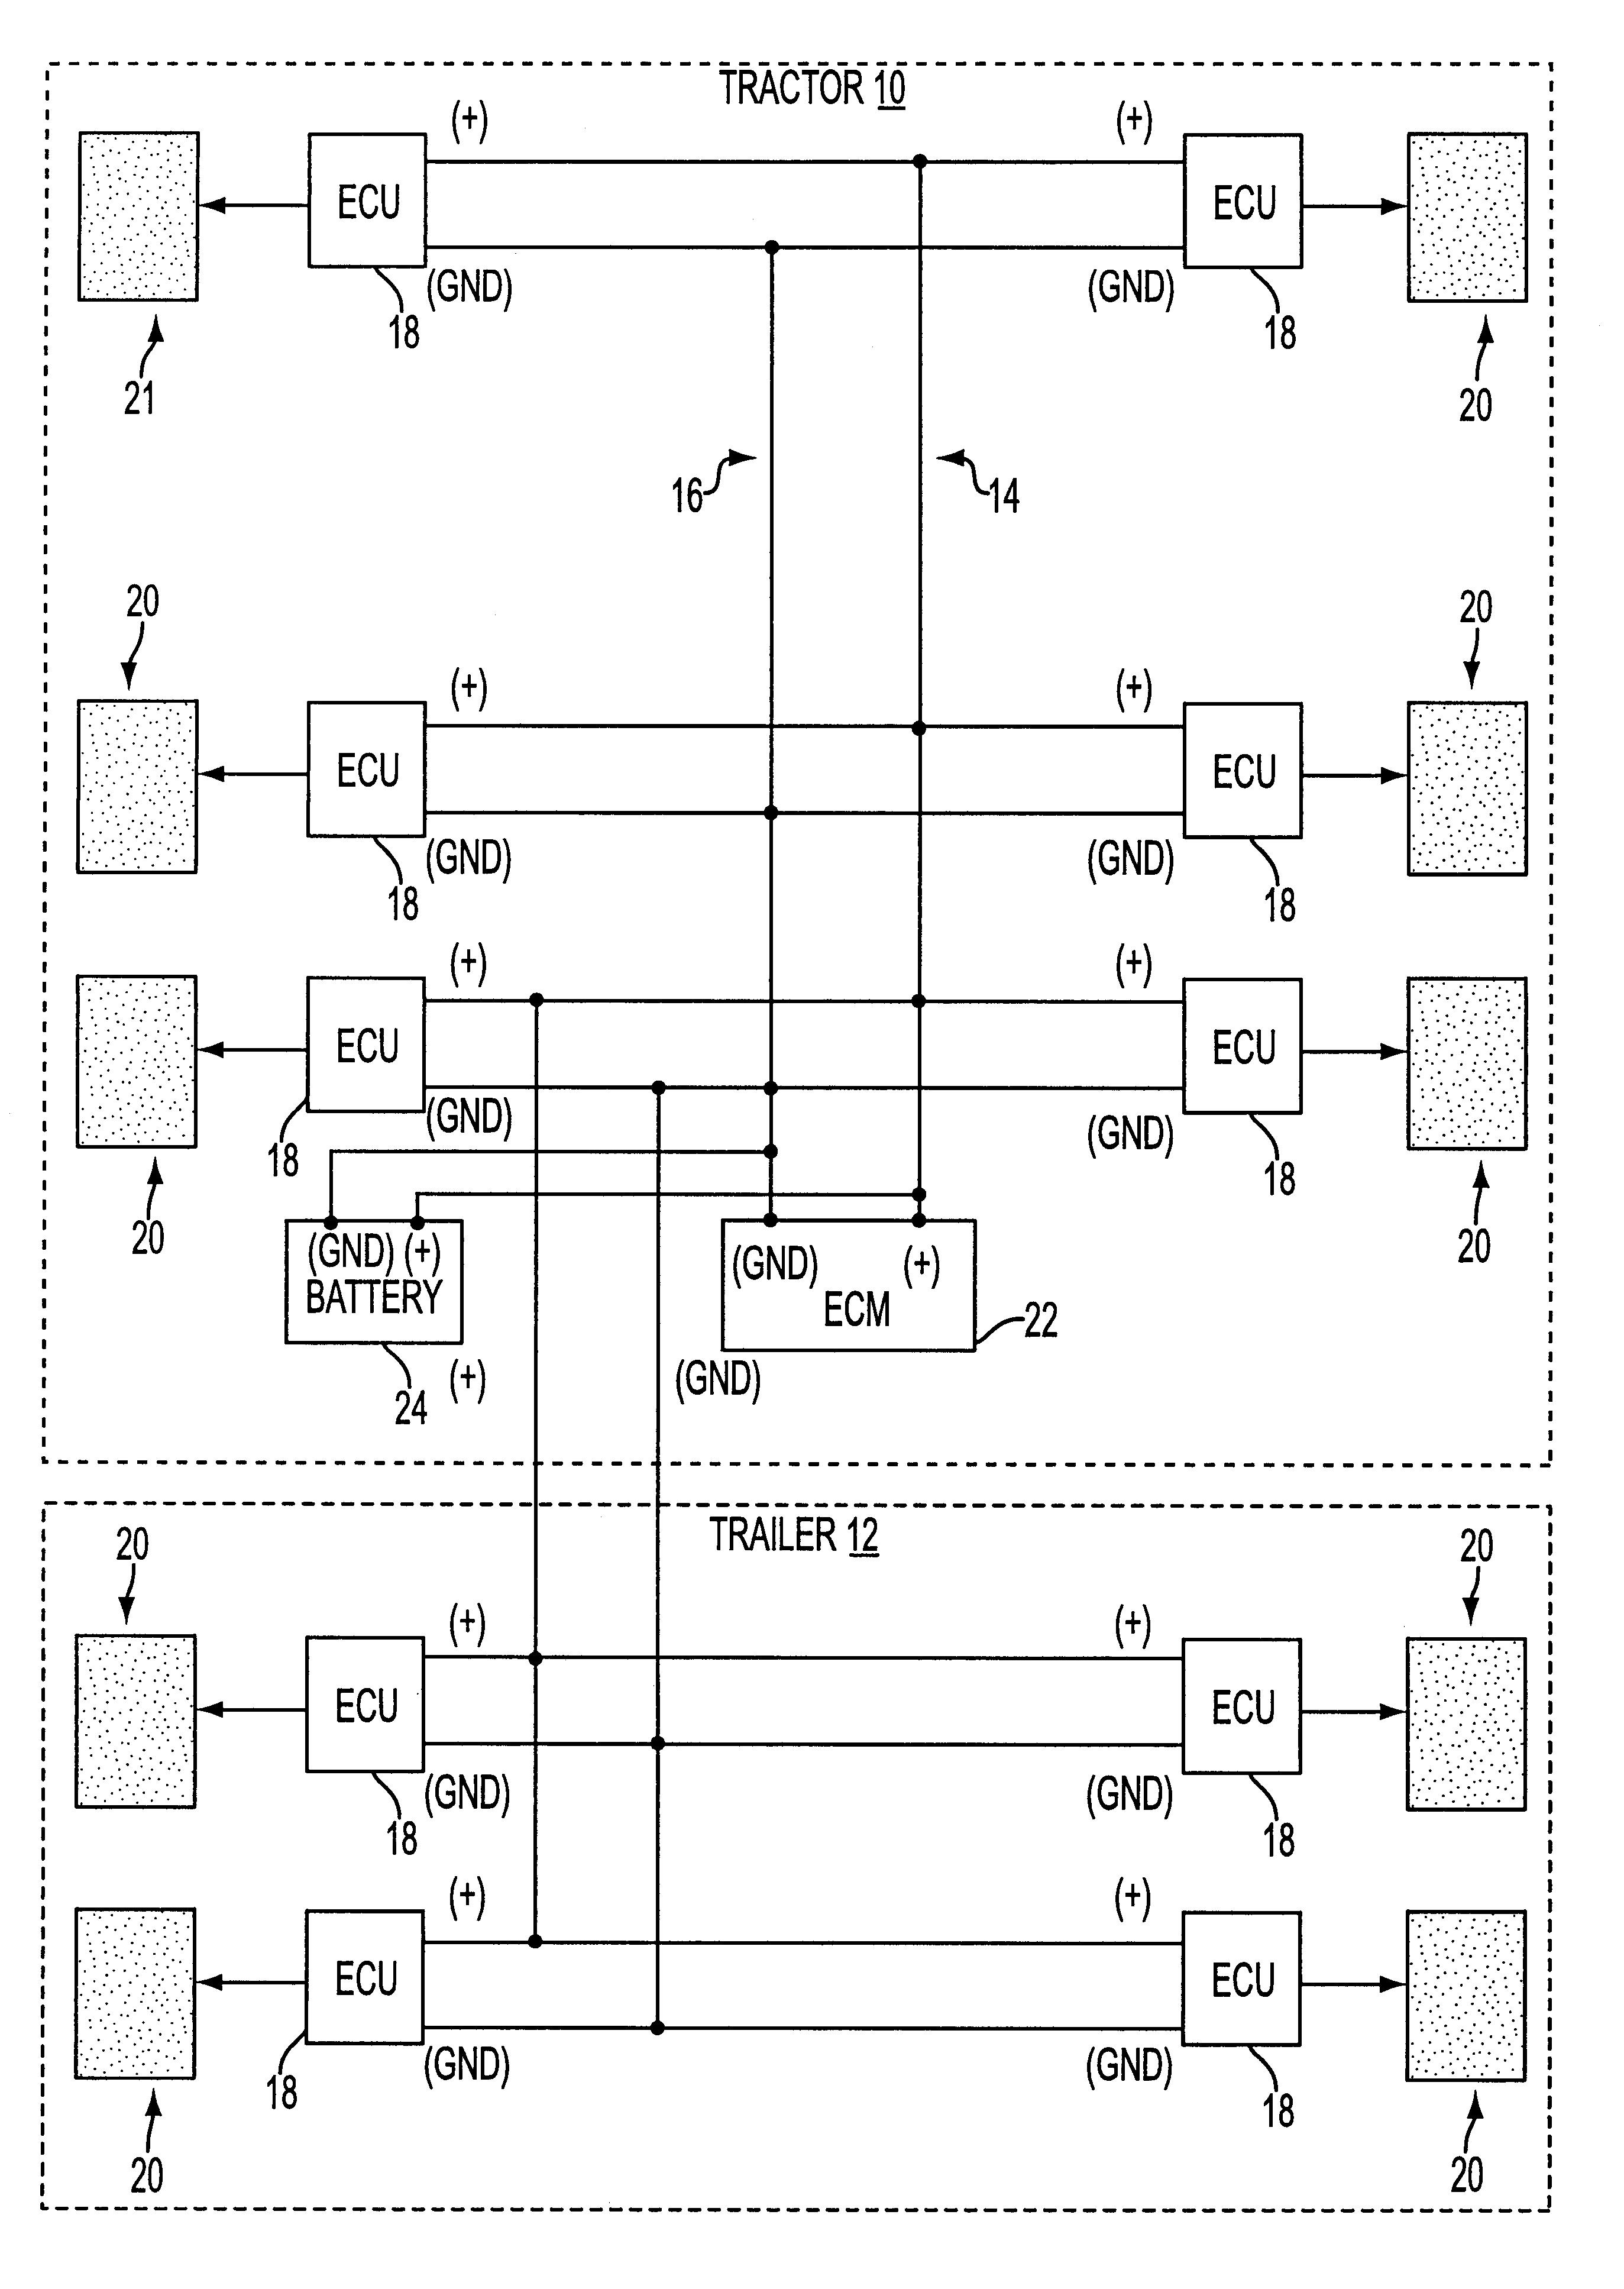 haldex semi trailer wiring diagram wiring diagram and ebooks • haldex semi trailer wiring diagram images gallery